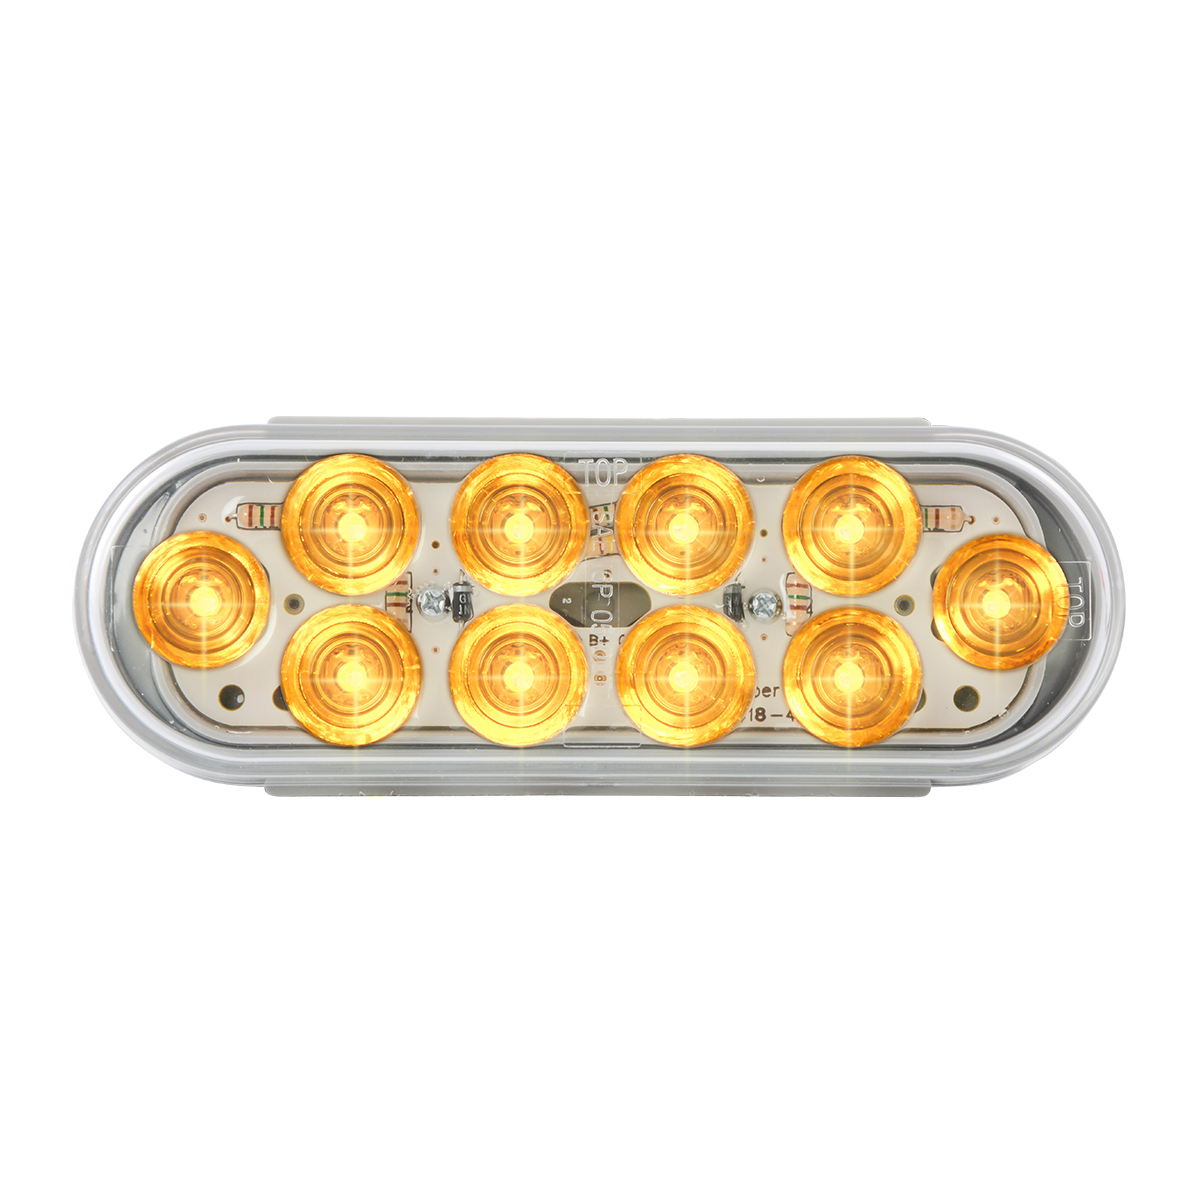 77441 Oval Mega 10 LED Light in Amber/Clear